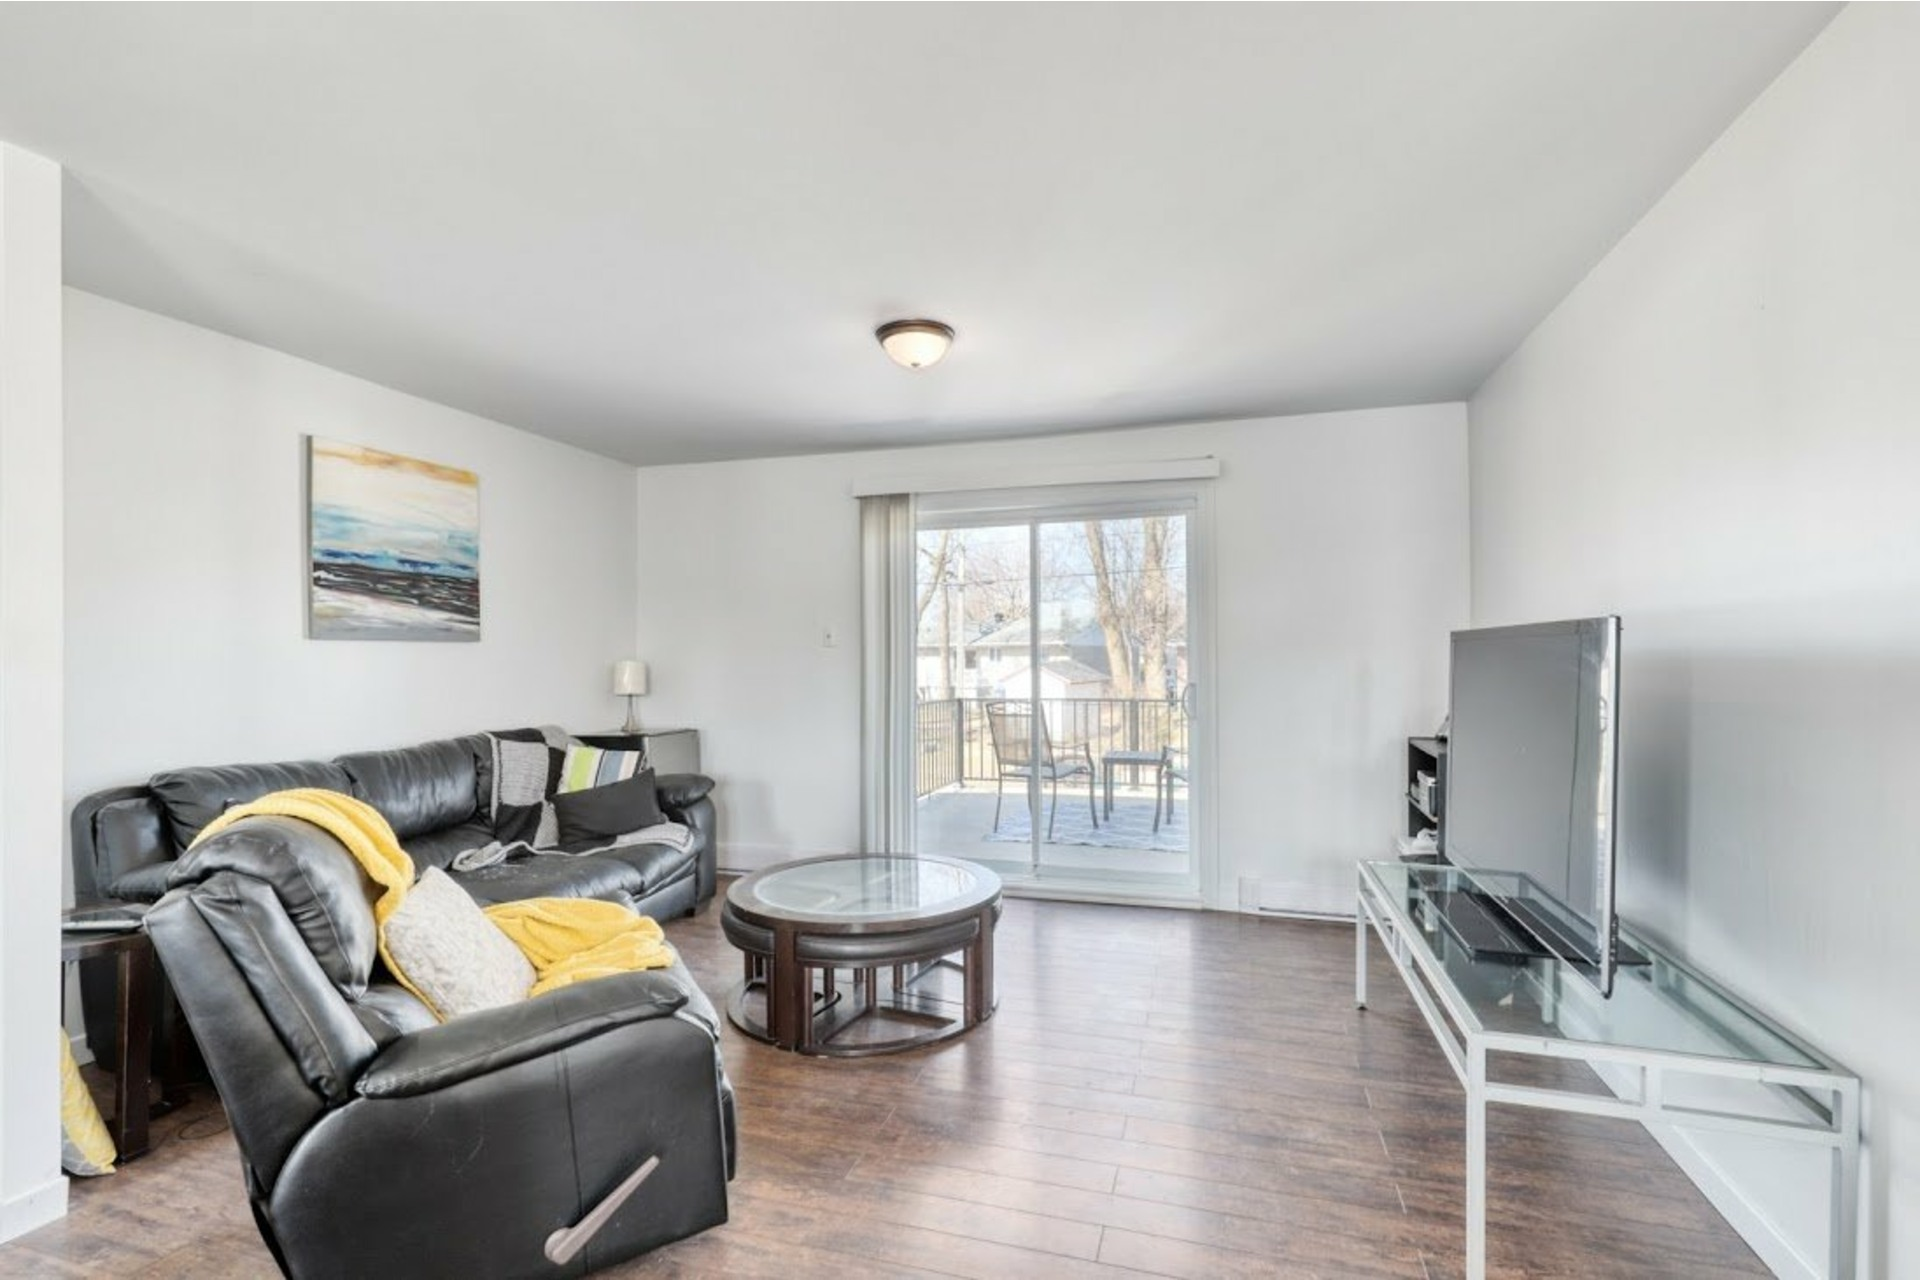 image 5 - House For sale Notre-Dame-des-Prairies - 11 rooms